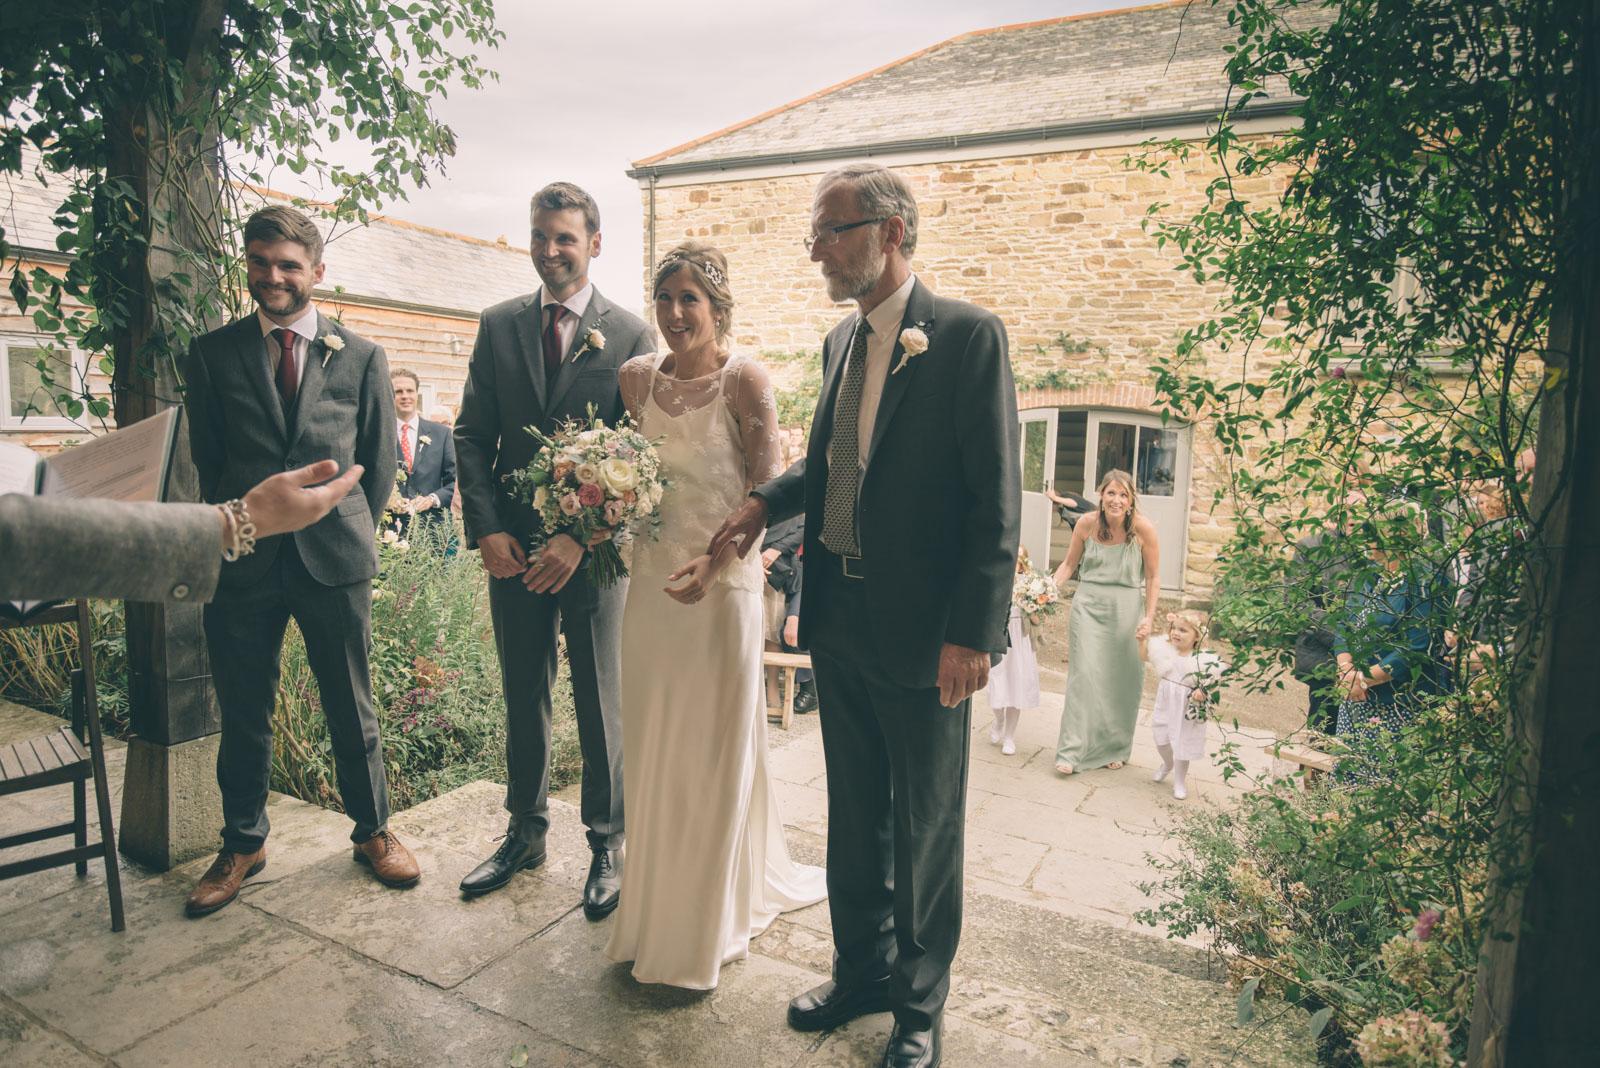 nancarrow-wedding-photography-39.jpg